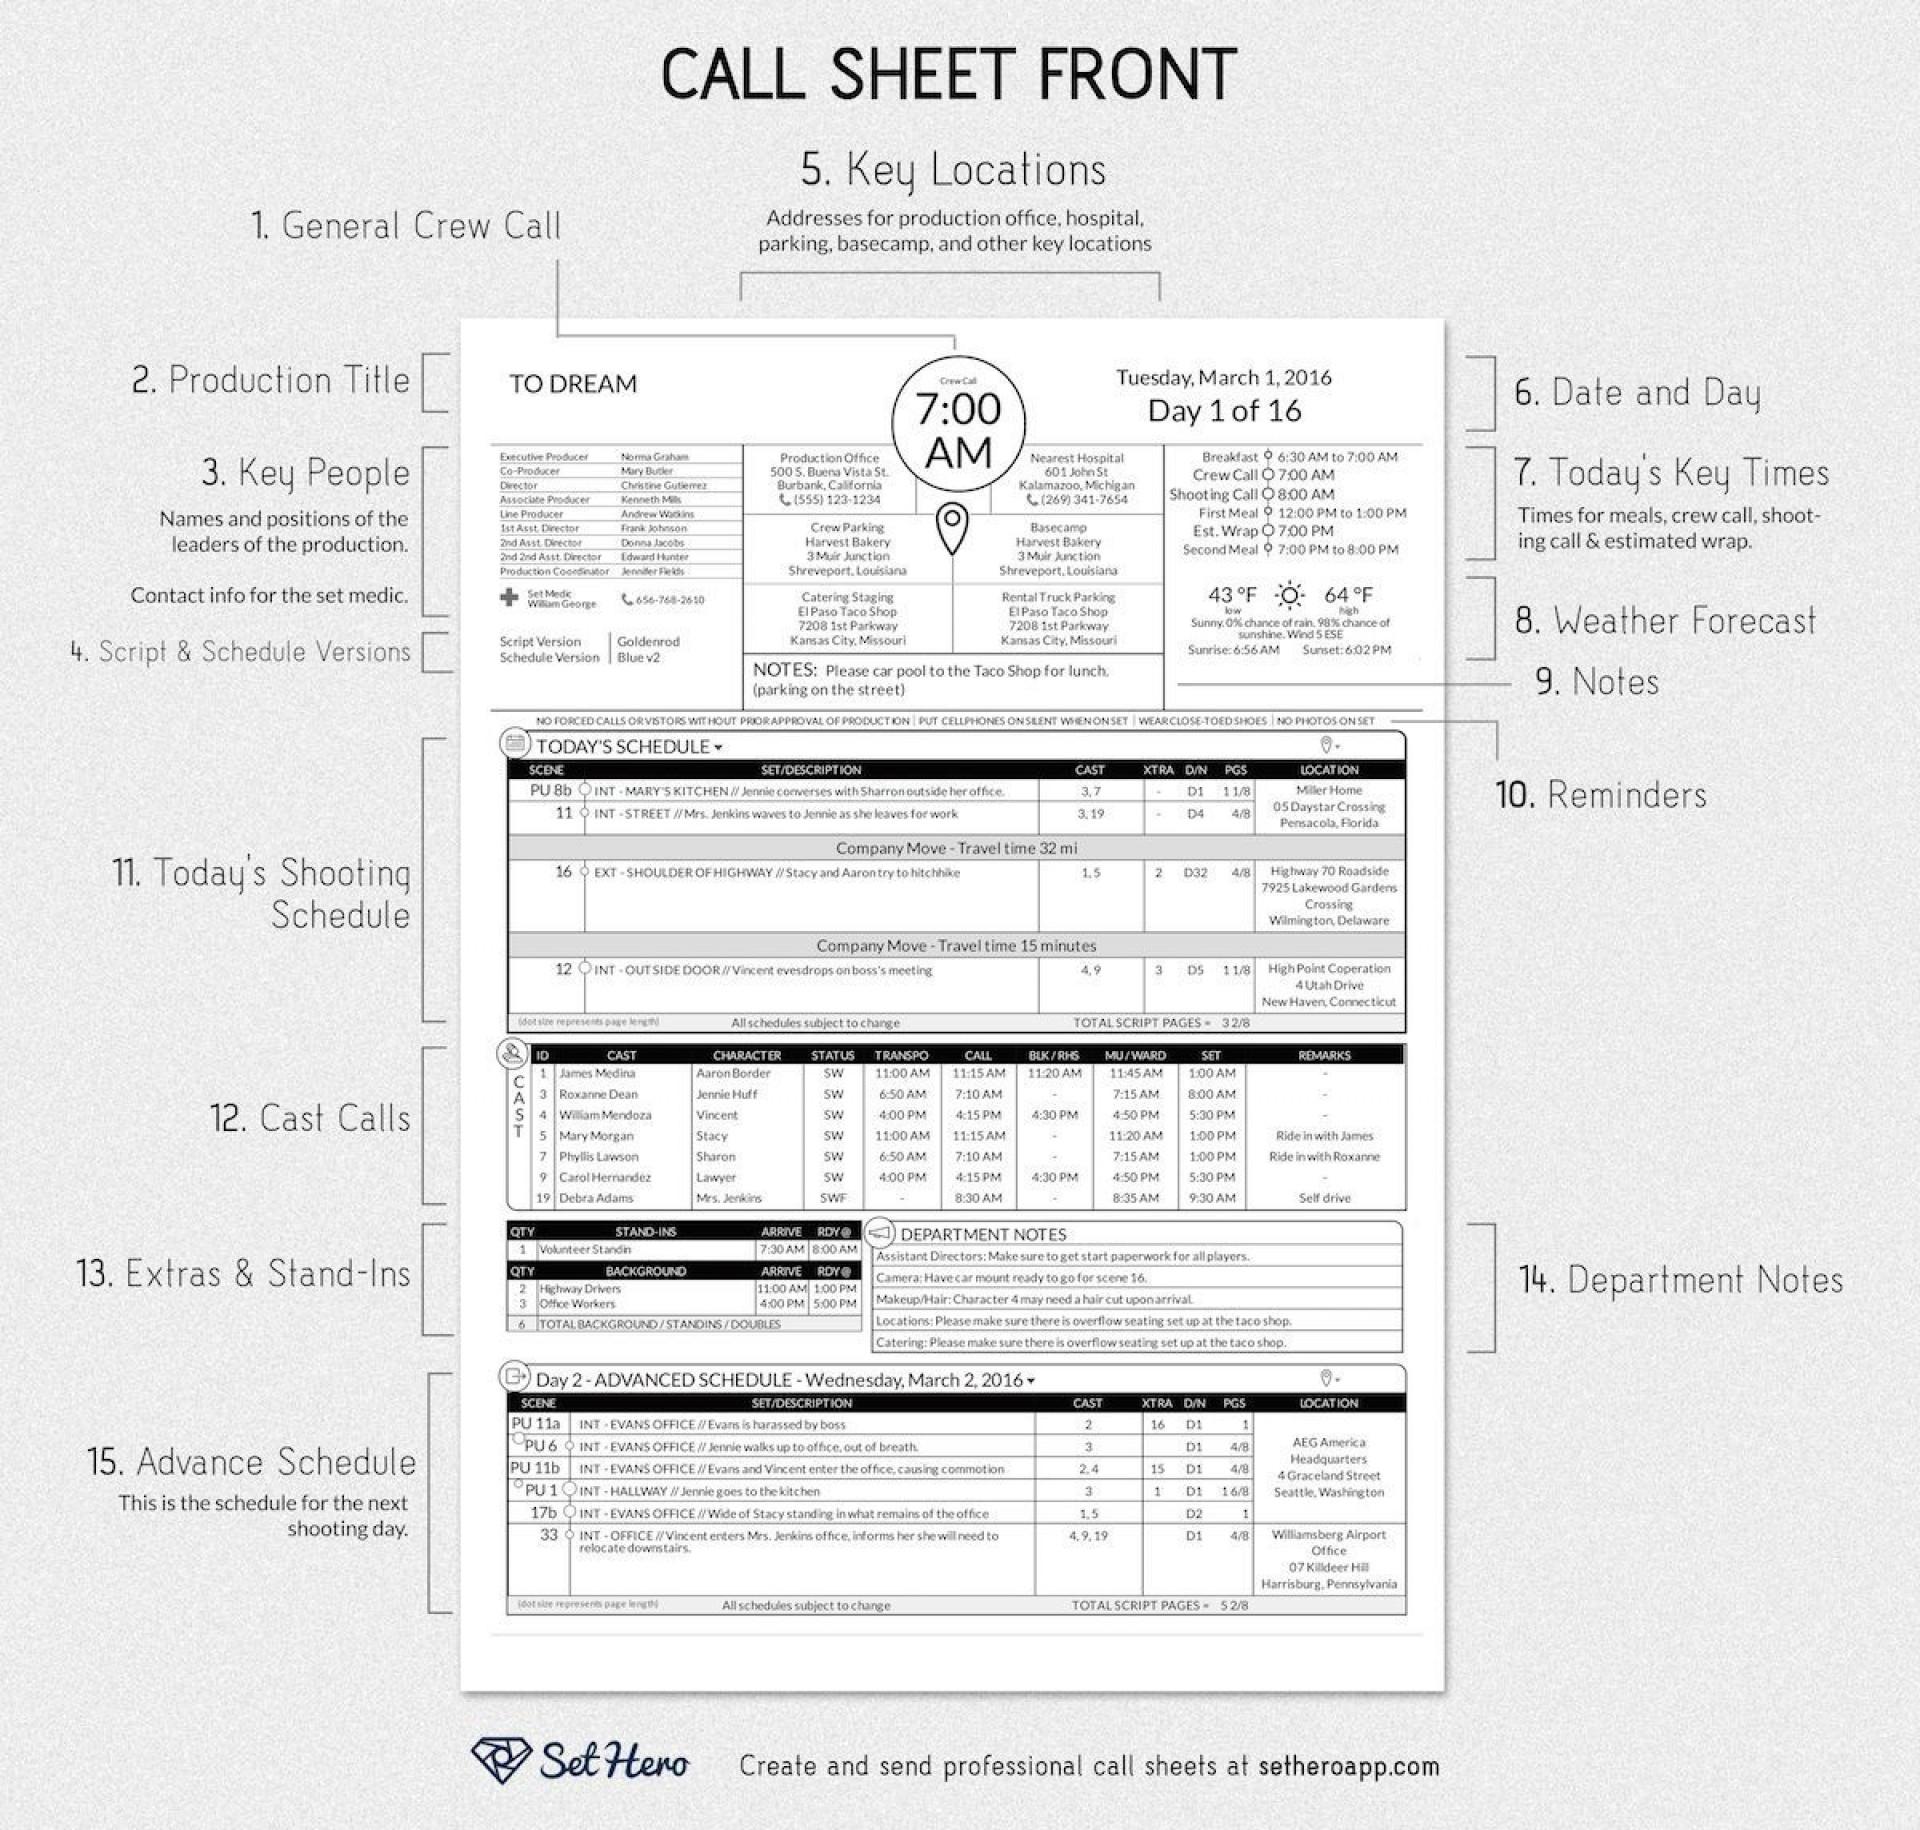 001 Fantastic Film Call Sheet Sample Idea  Template Download Excel Google Doc1920